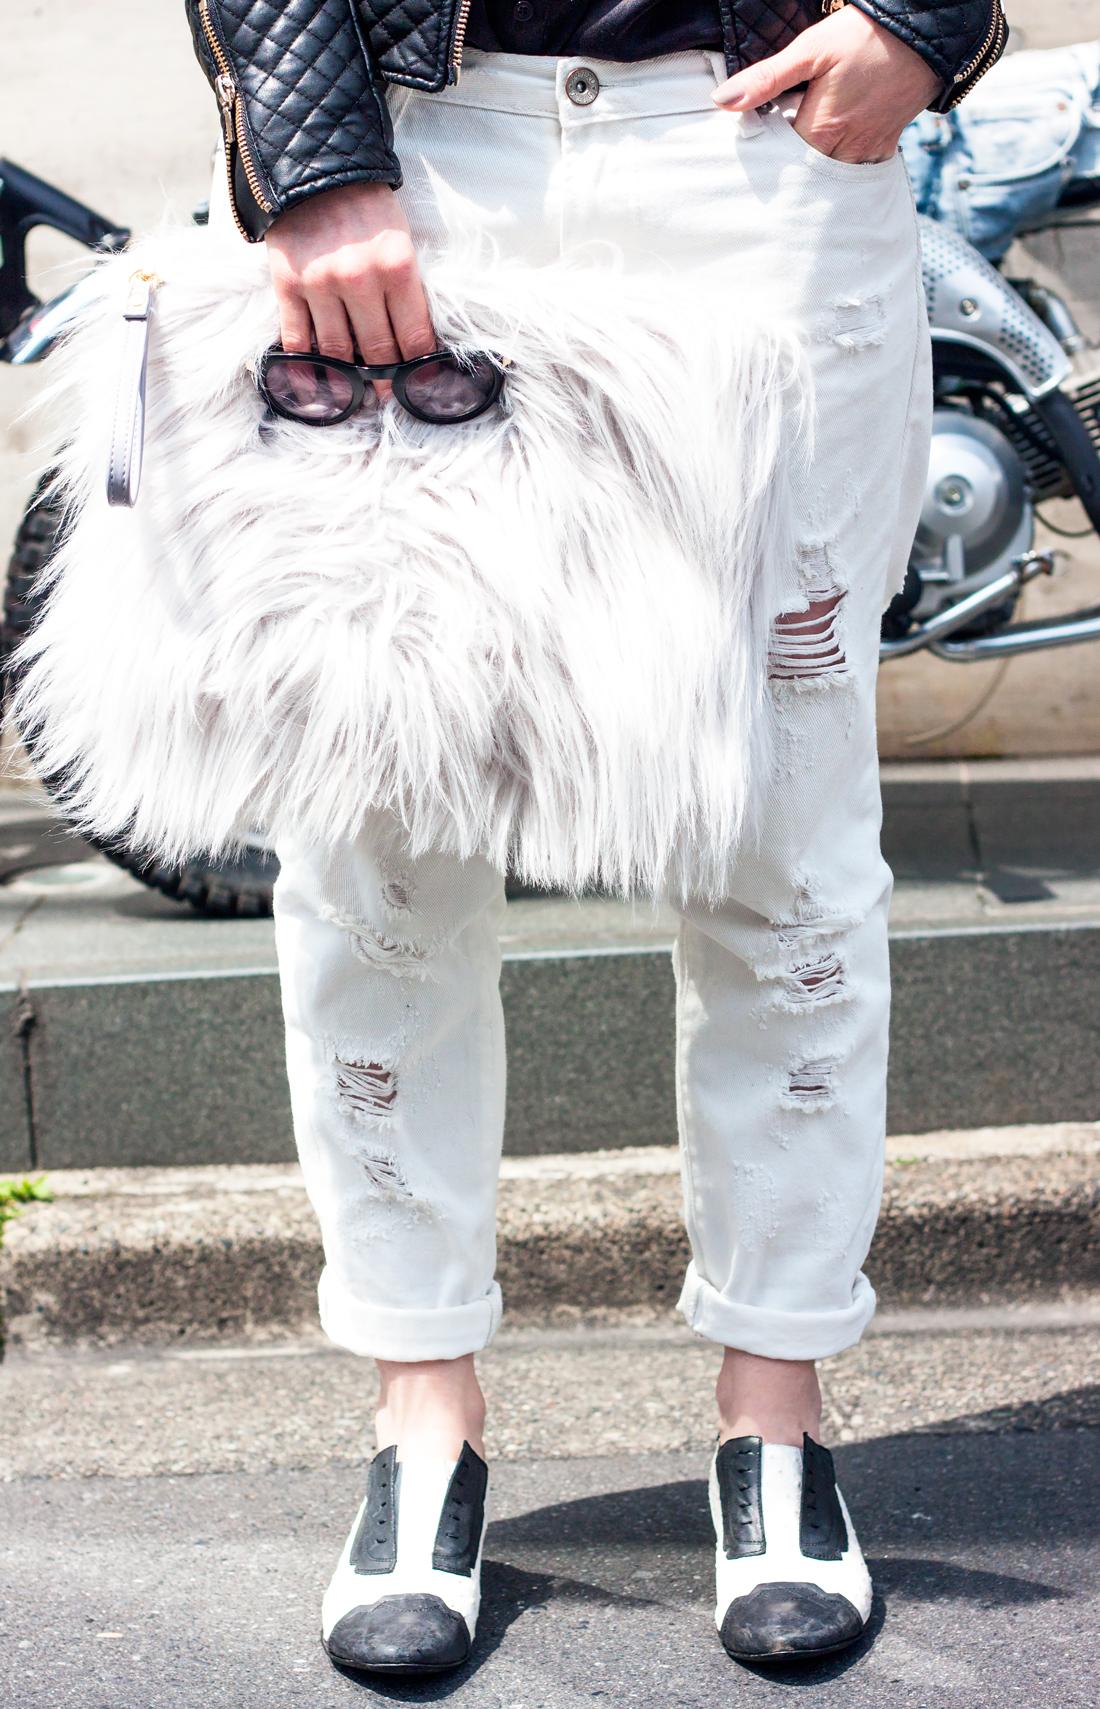 omotesando tokyo, tokyo fashion, faux fur clutch, motorbikes tokyo, grey fedora felt hat, white boyfriend jeans, japan fashion, tokyo fashion blog